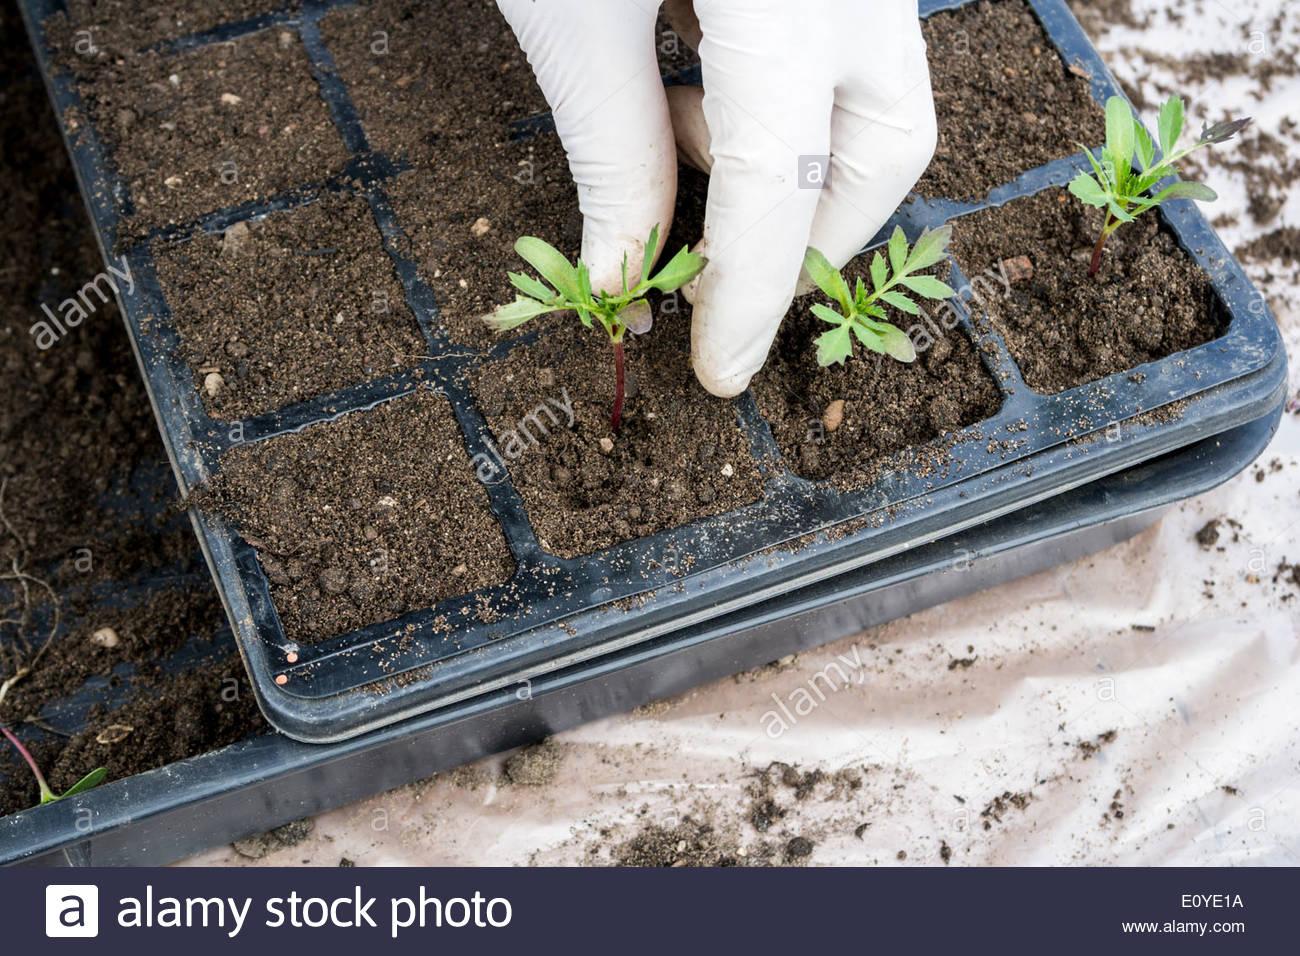 Gardener Transplanting Marigold Seedlings Stock Photo 69445190